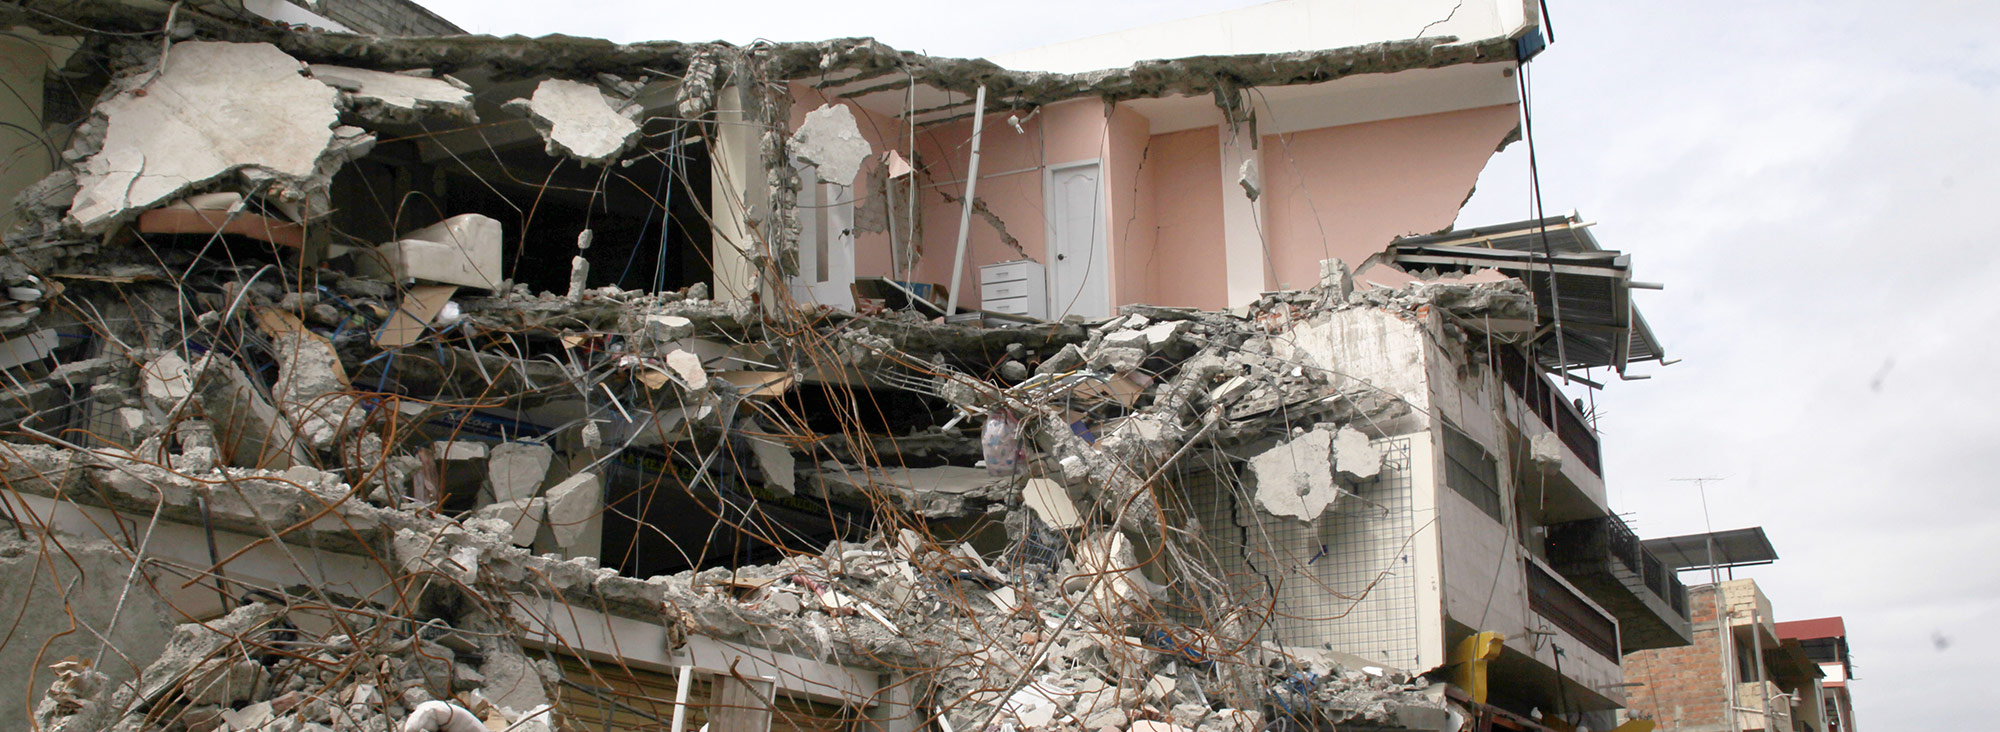 Slider preguntas terremoto